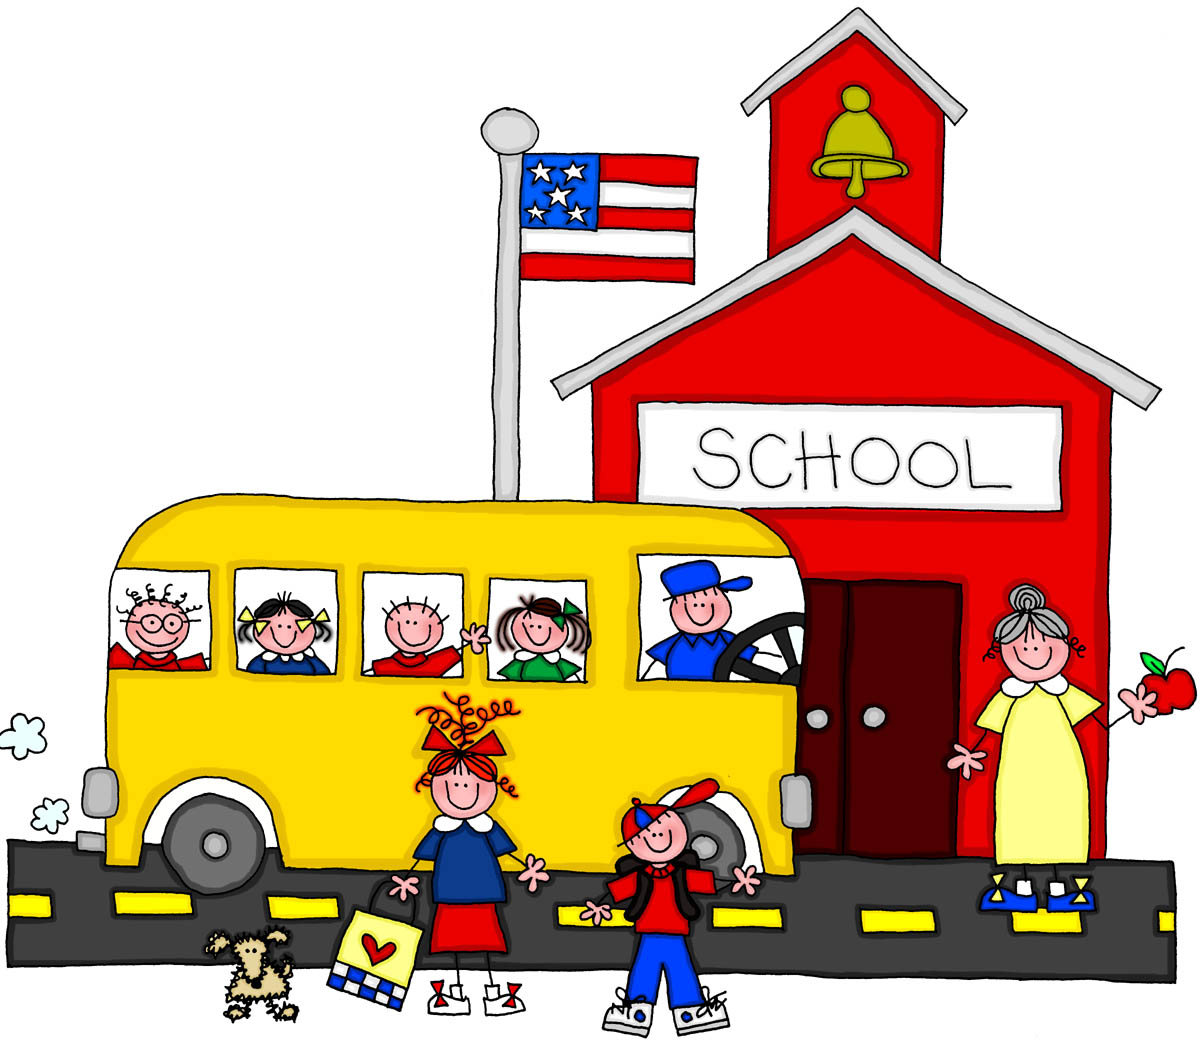 New Academic Calendar Zone Wabash College Calendar Crawfordsville Indiana Home Private Or Public School – Raisingodlychildren